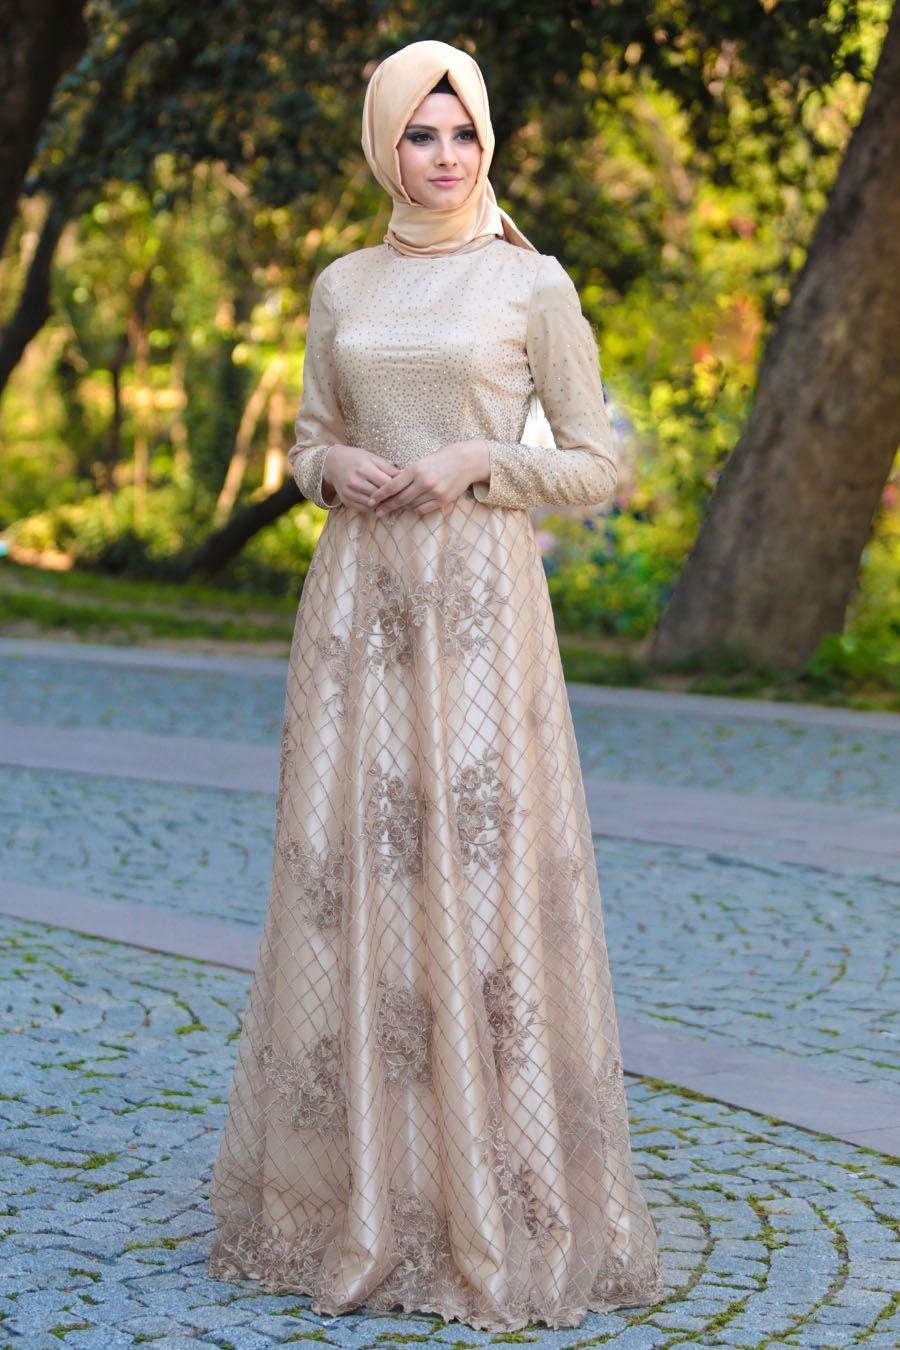 Tesetturlu Abiye Elbiseler Tesetturlu Abiye Elbise Uzeri Tas Detayli Ekru Tesettur Abiye Elbise 4394e Muslimah Dress Fashion Clothes For Women